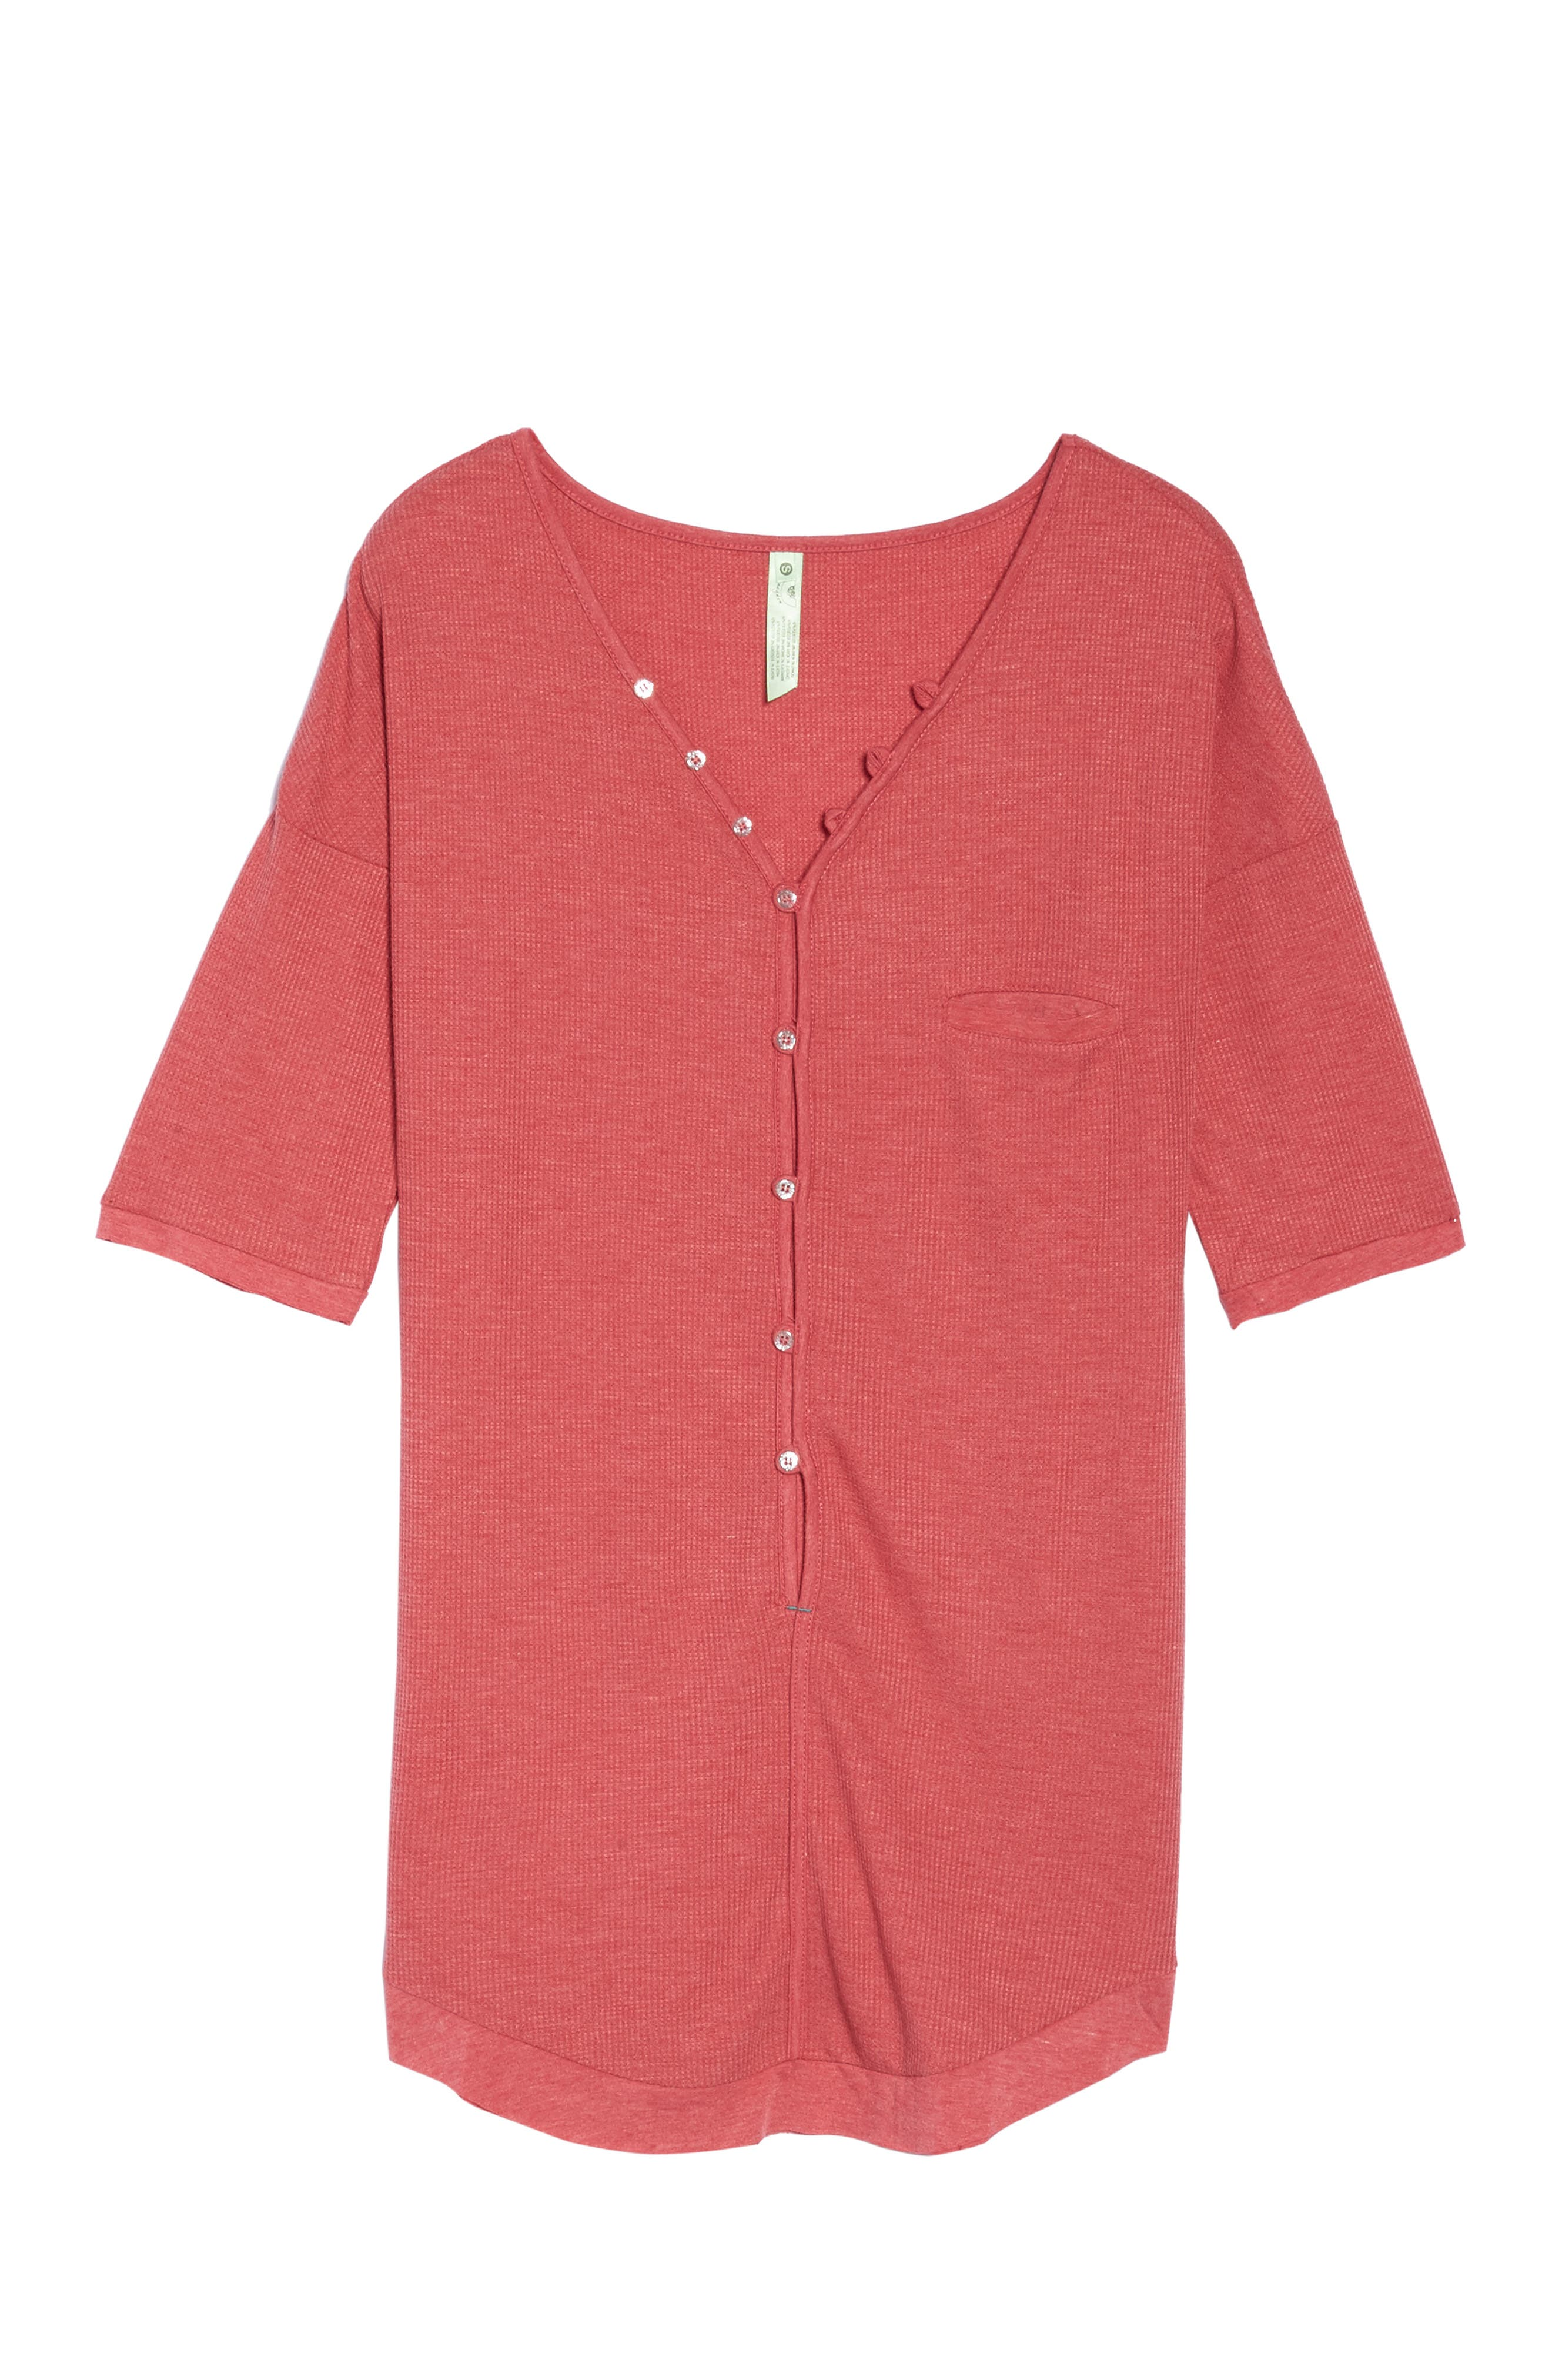 Sleep Shirt,                             Alternate thumbnail 4, color,                             Ruby